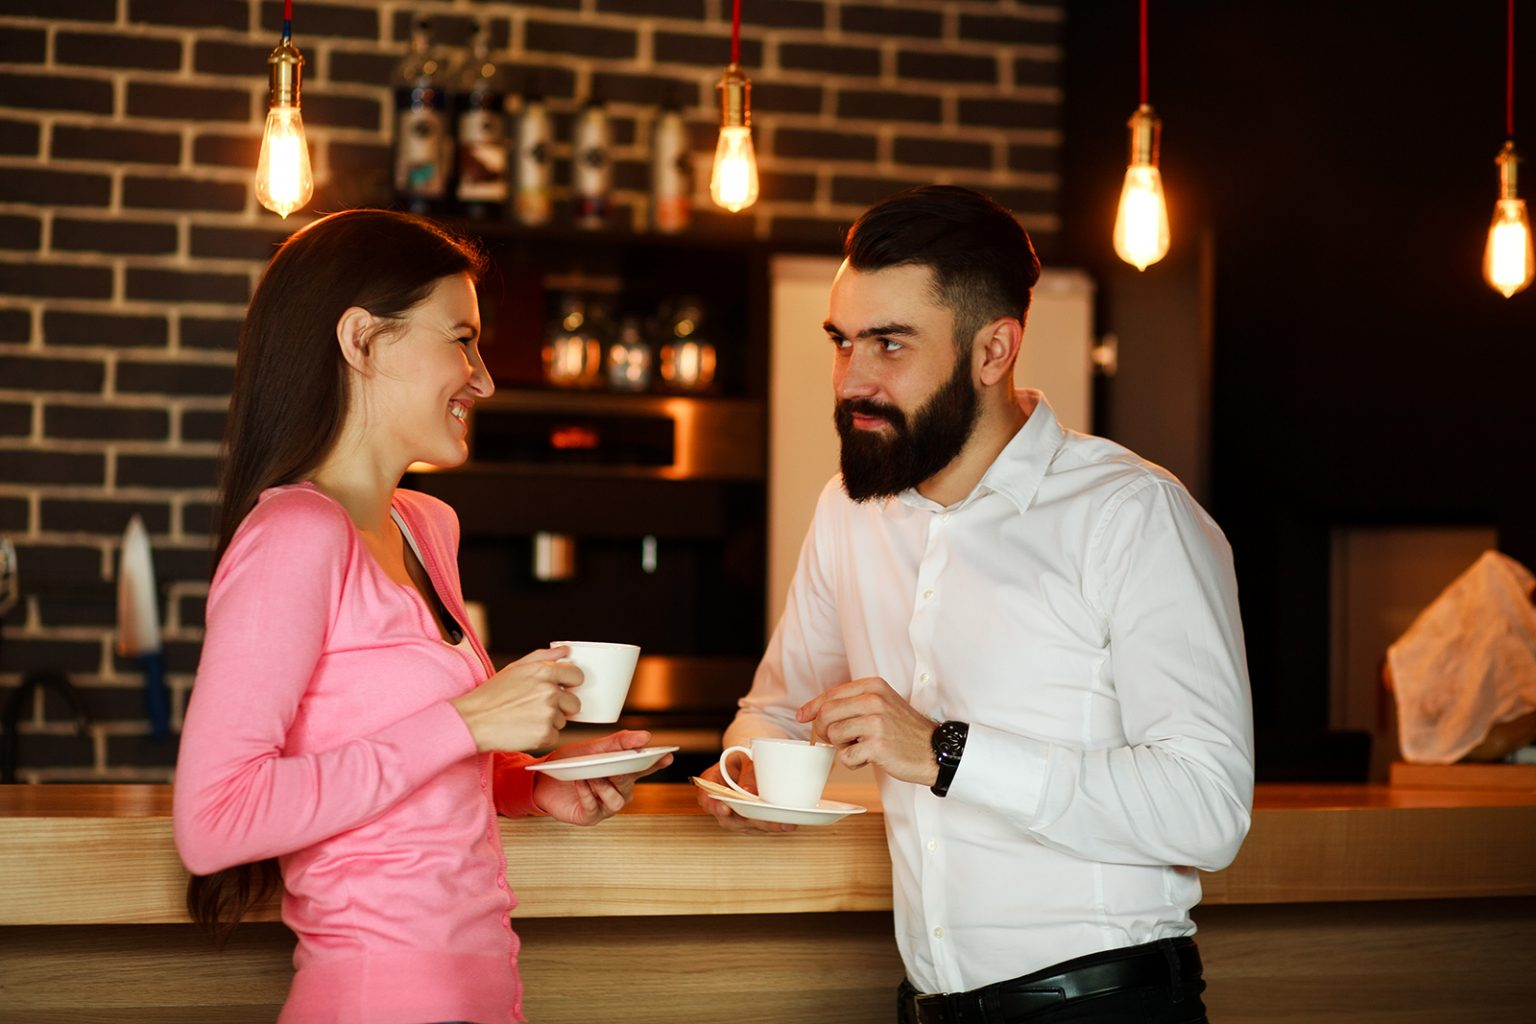 Flirten männer nur aus spaß